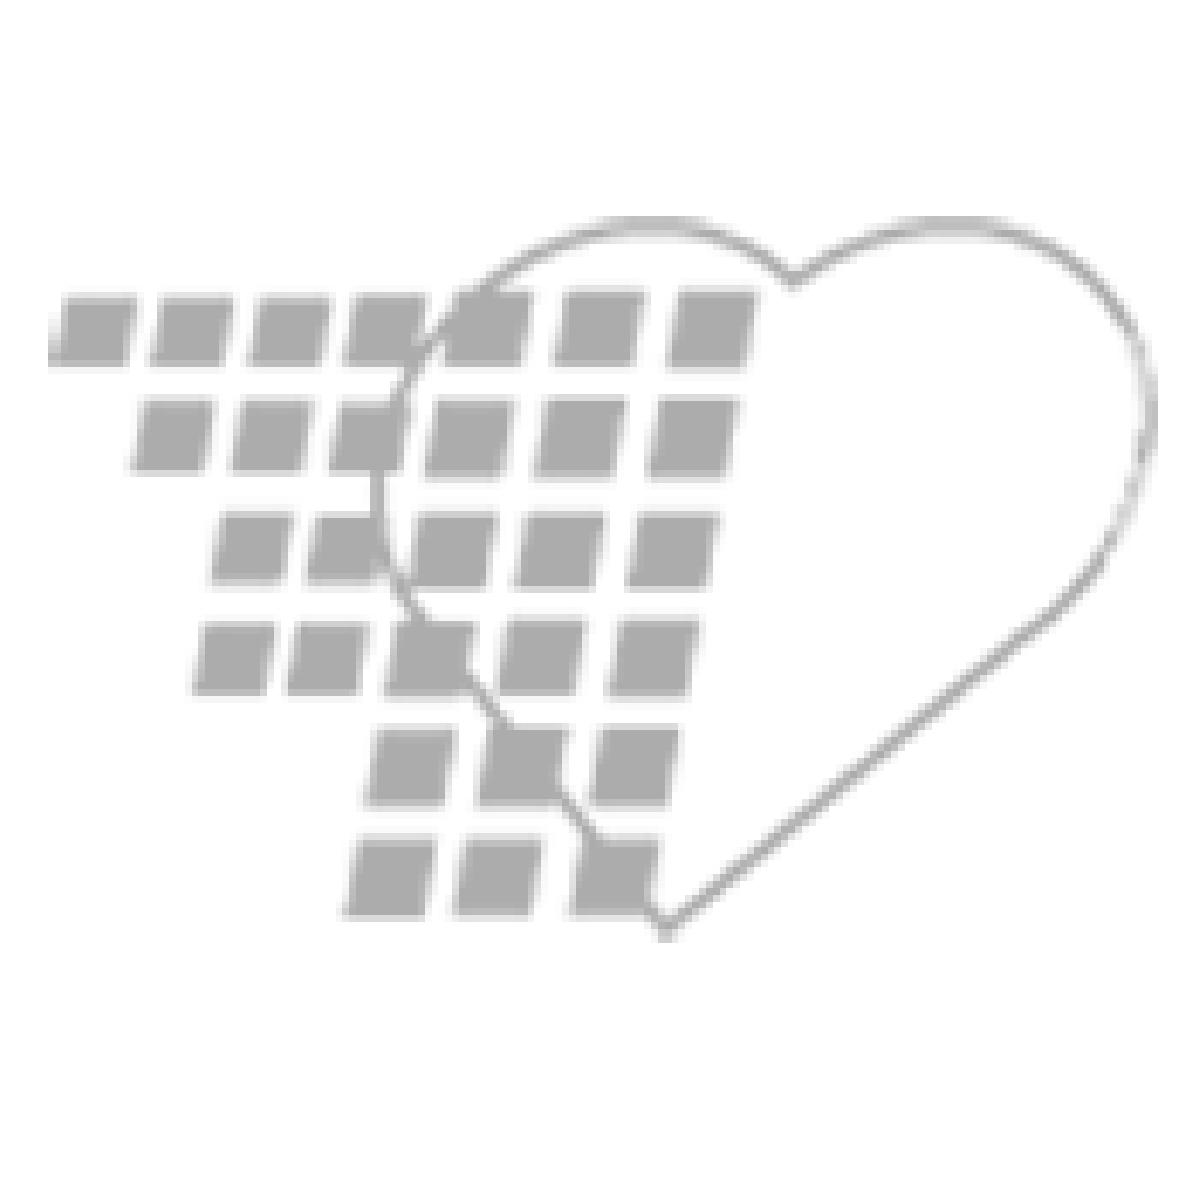 02-43-2038 CareScape V100 with Temperature SP02  with Printer